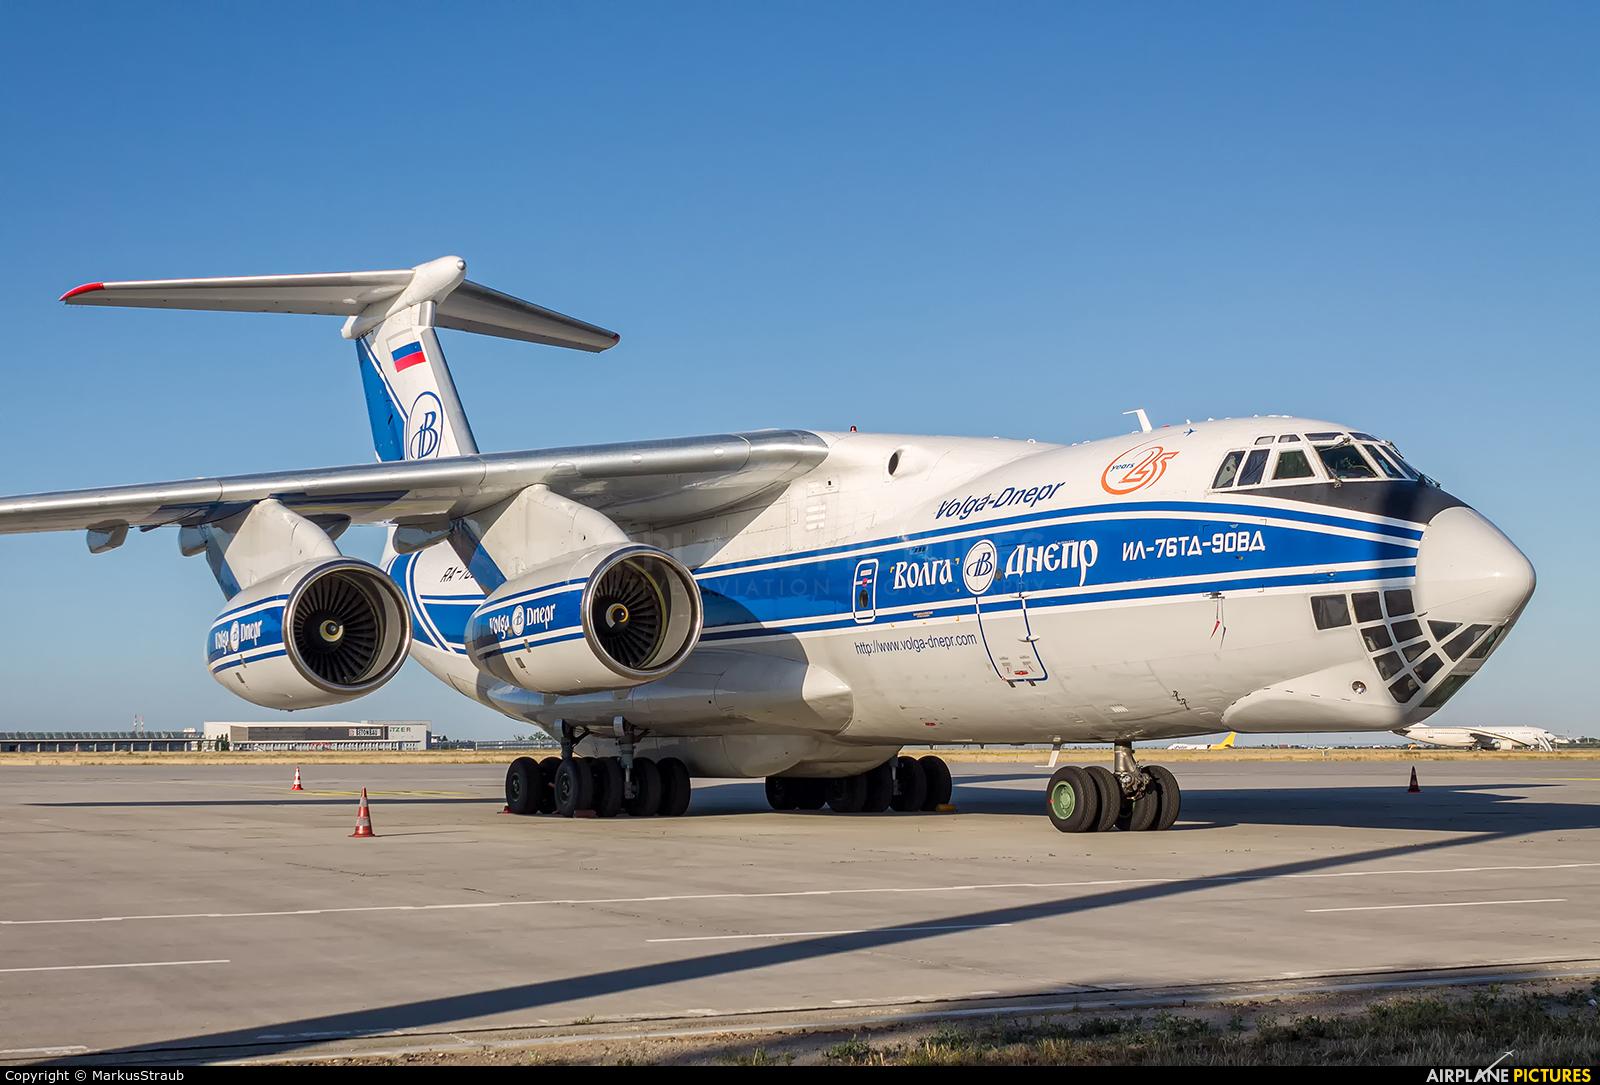 Volga Dnepr Airlines RA-76951 aircraft at Leipzig - Halle